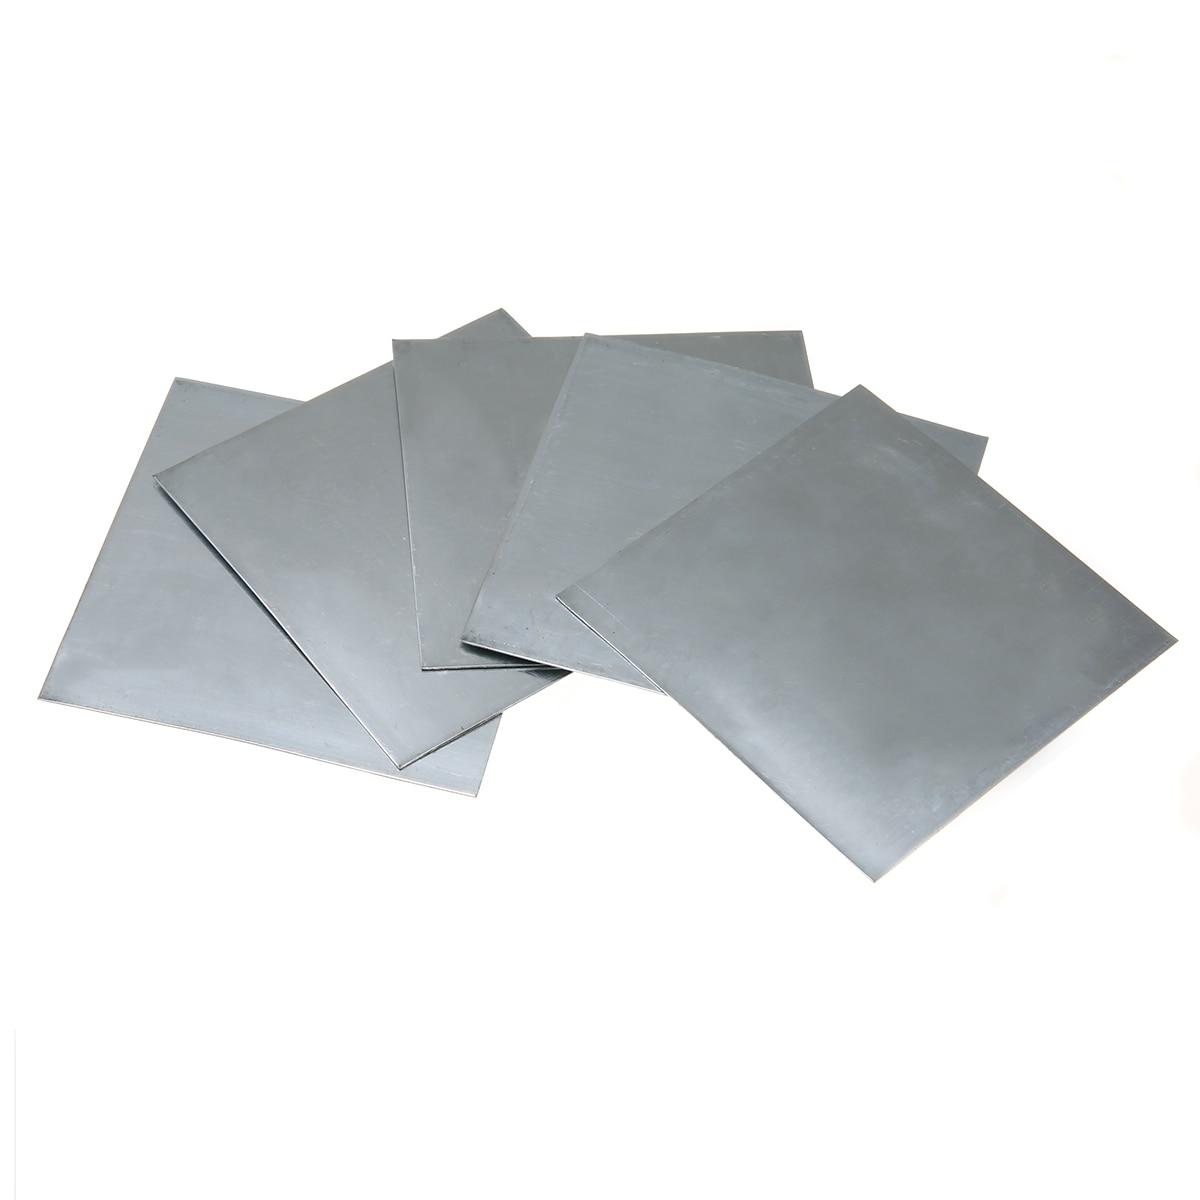 5pcs High-purity Pure Zinc Zn Sheet Plate 0.5mm Thickness Metal Foil 100mmx100mm For Power Tools 1sheet matte surface 3k 100% carbon fiber plate sheet 2mm thickness